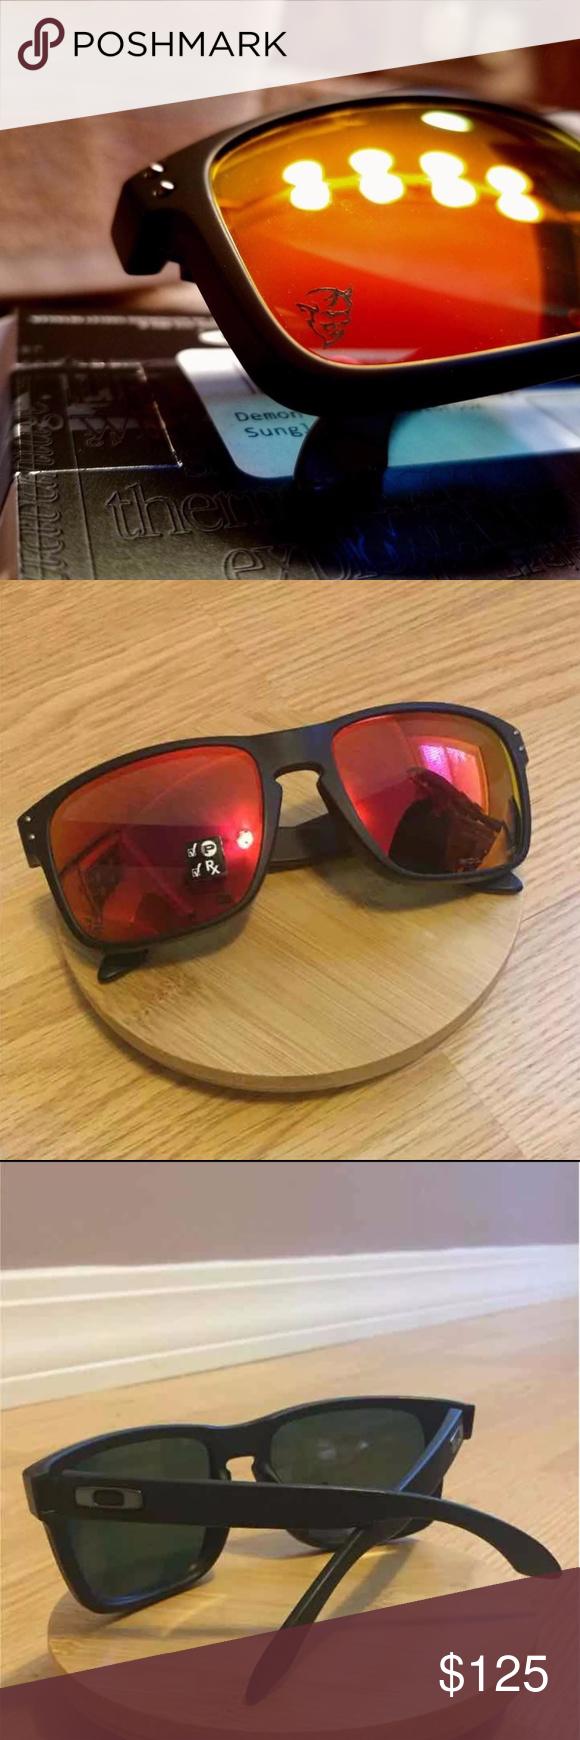 51595c0094 Dodge Demon Oakley Sunglasses Brand new Oakley Sunglasses! NIB Limited  Edition Dodge Demon Oakley